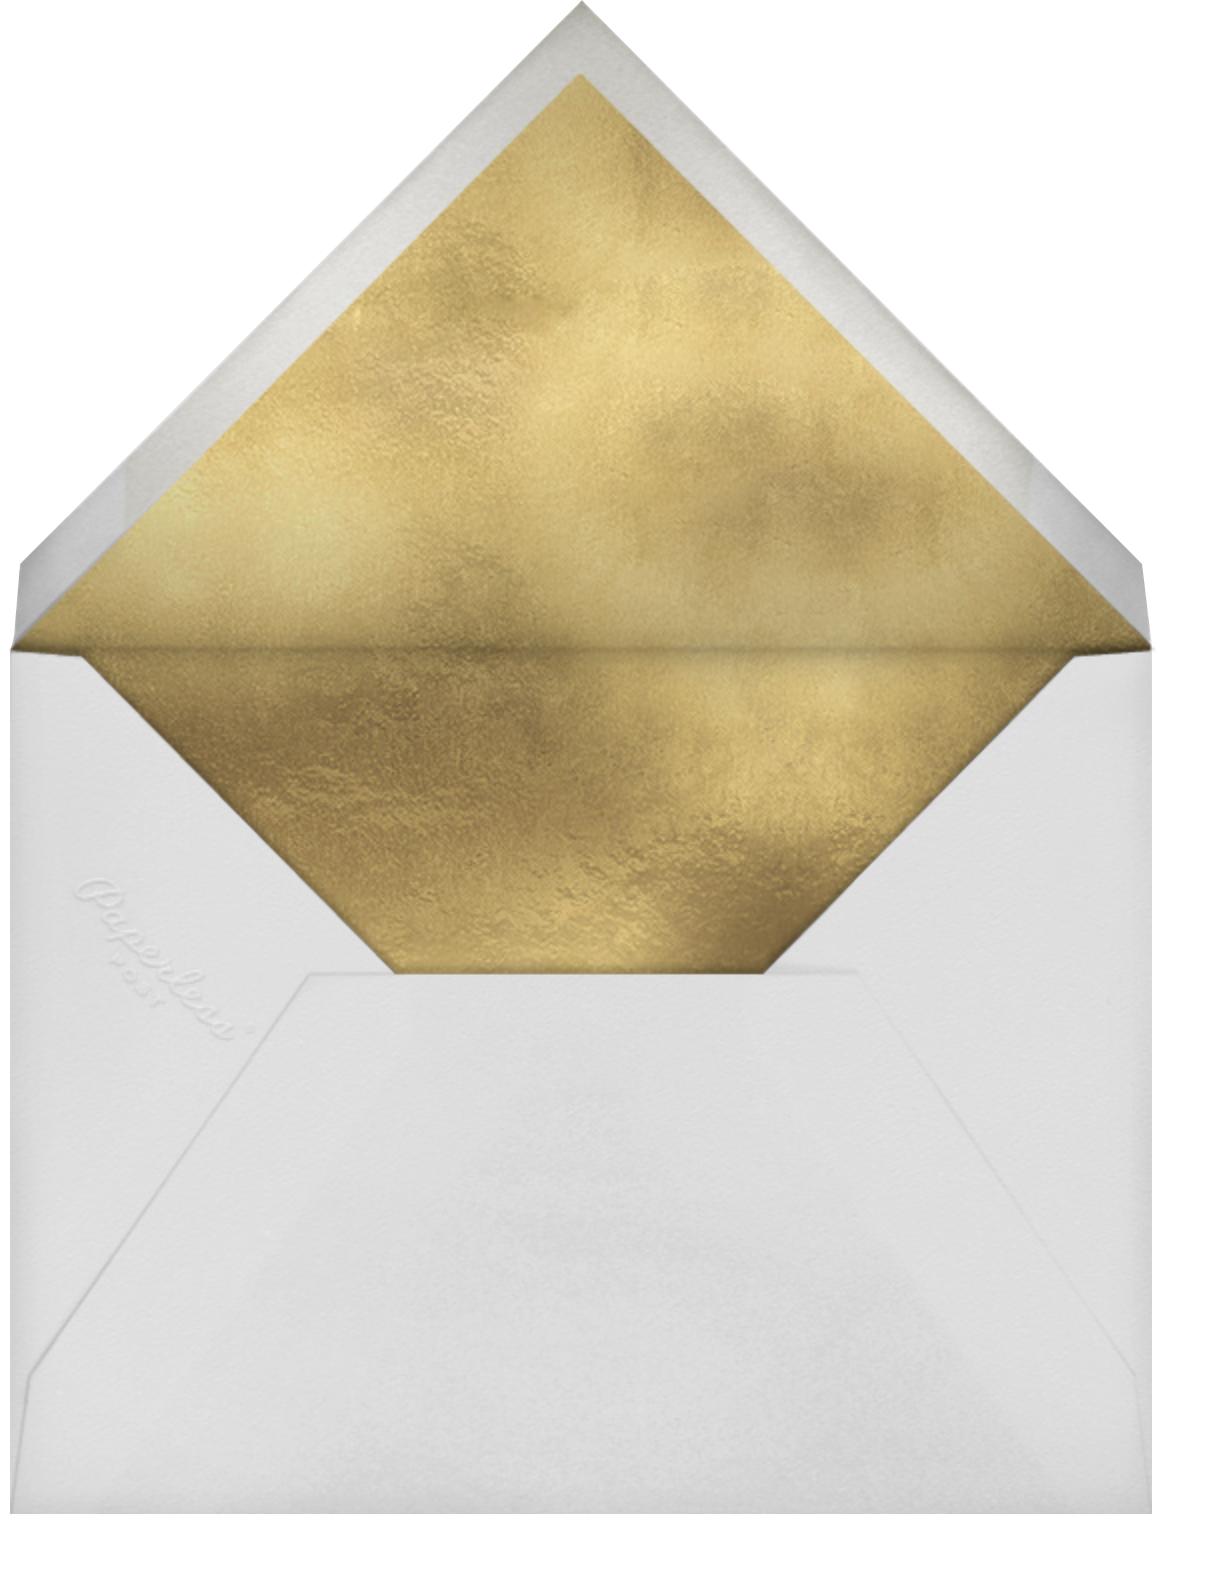 Wildflower Calico - White/Blossom - Oscar de la Renta - Adult birthday - envelope back